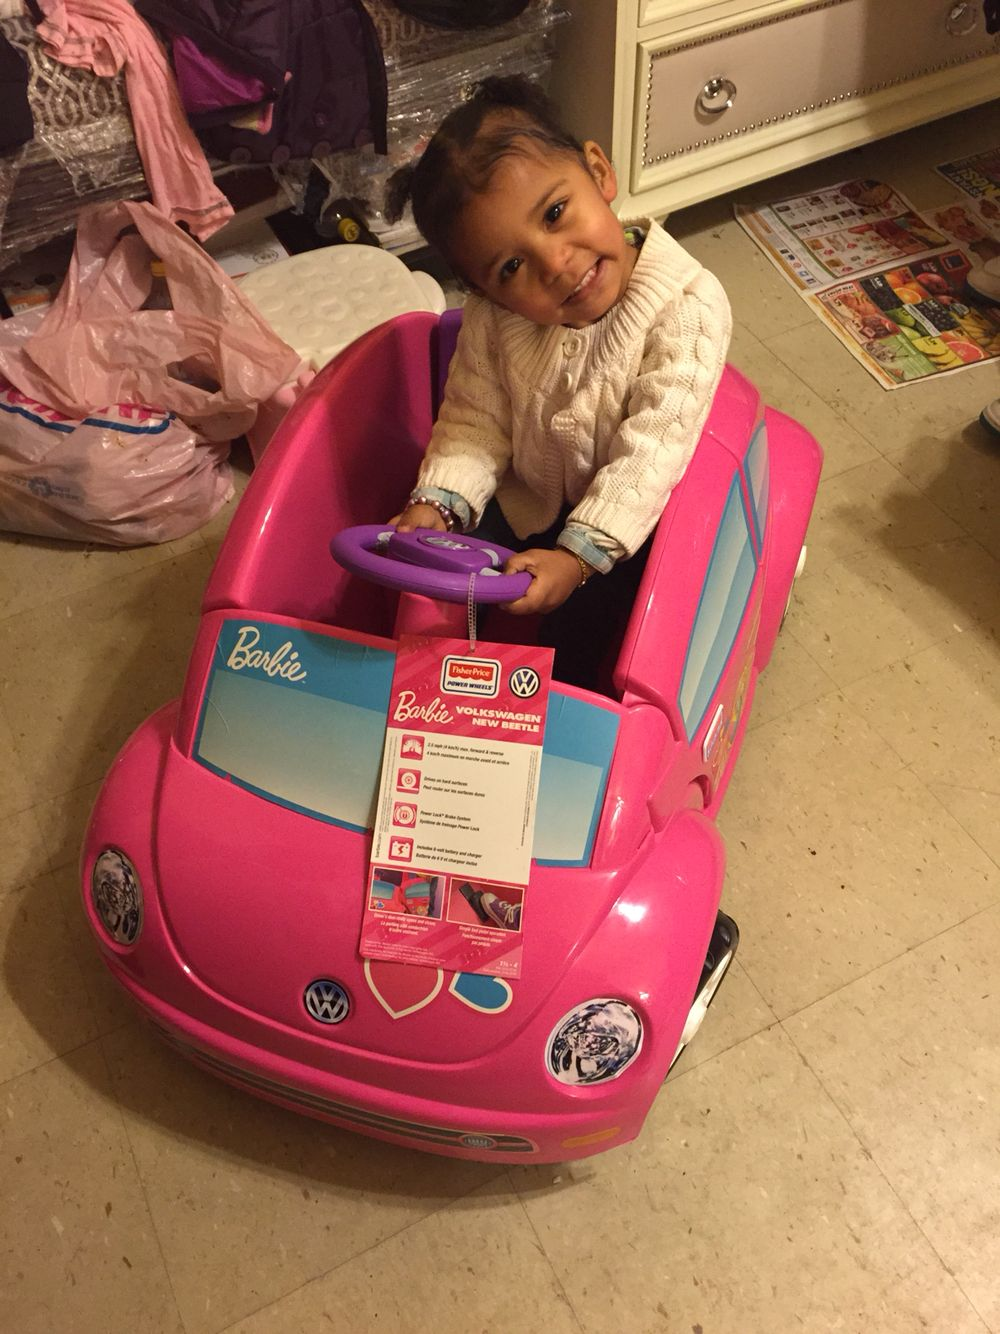 Angie xmas she got a car